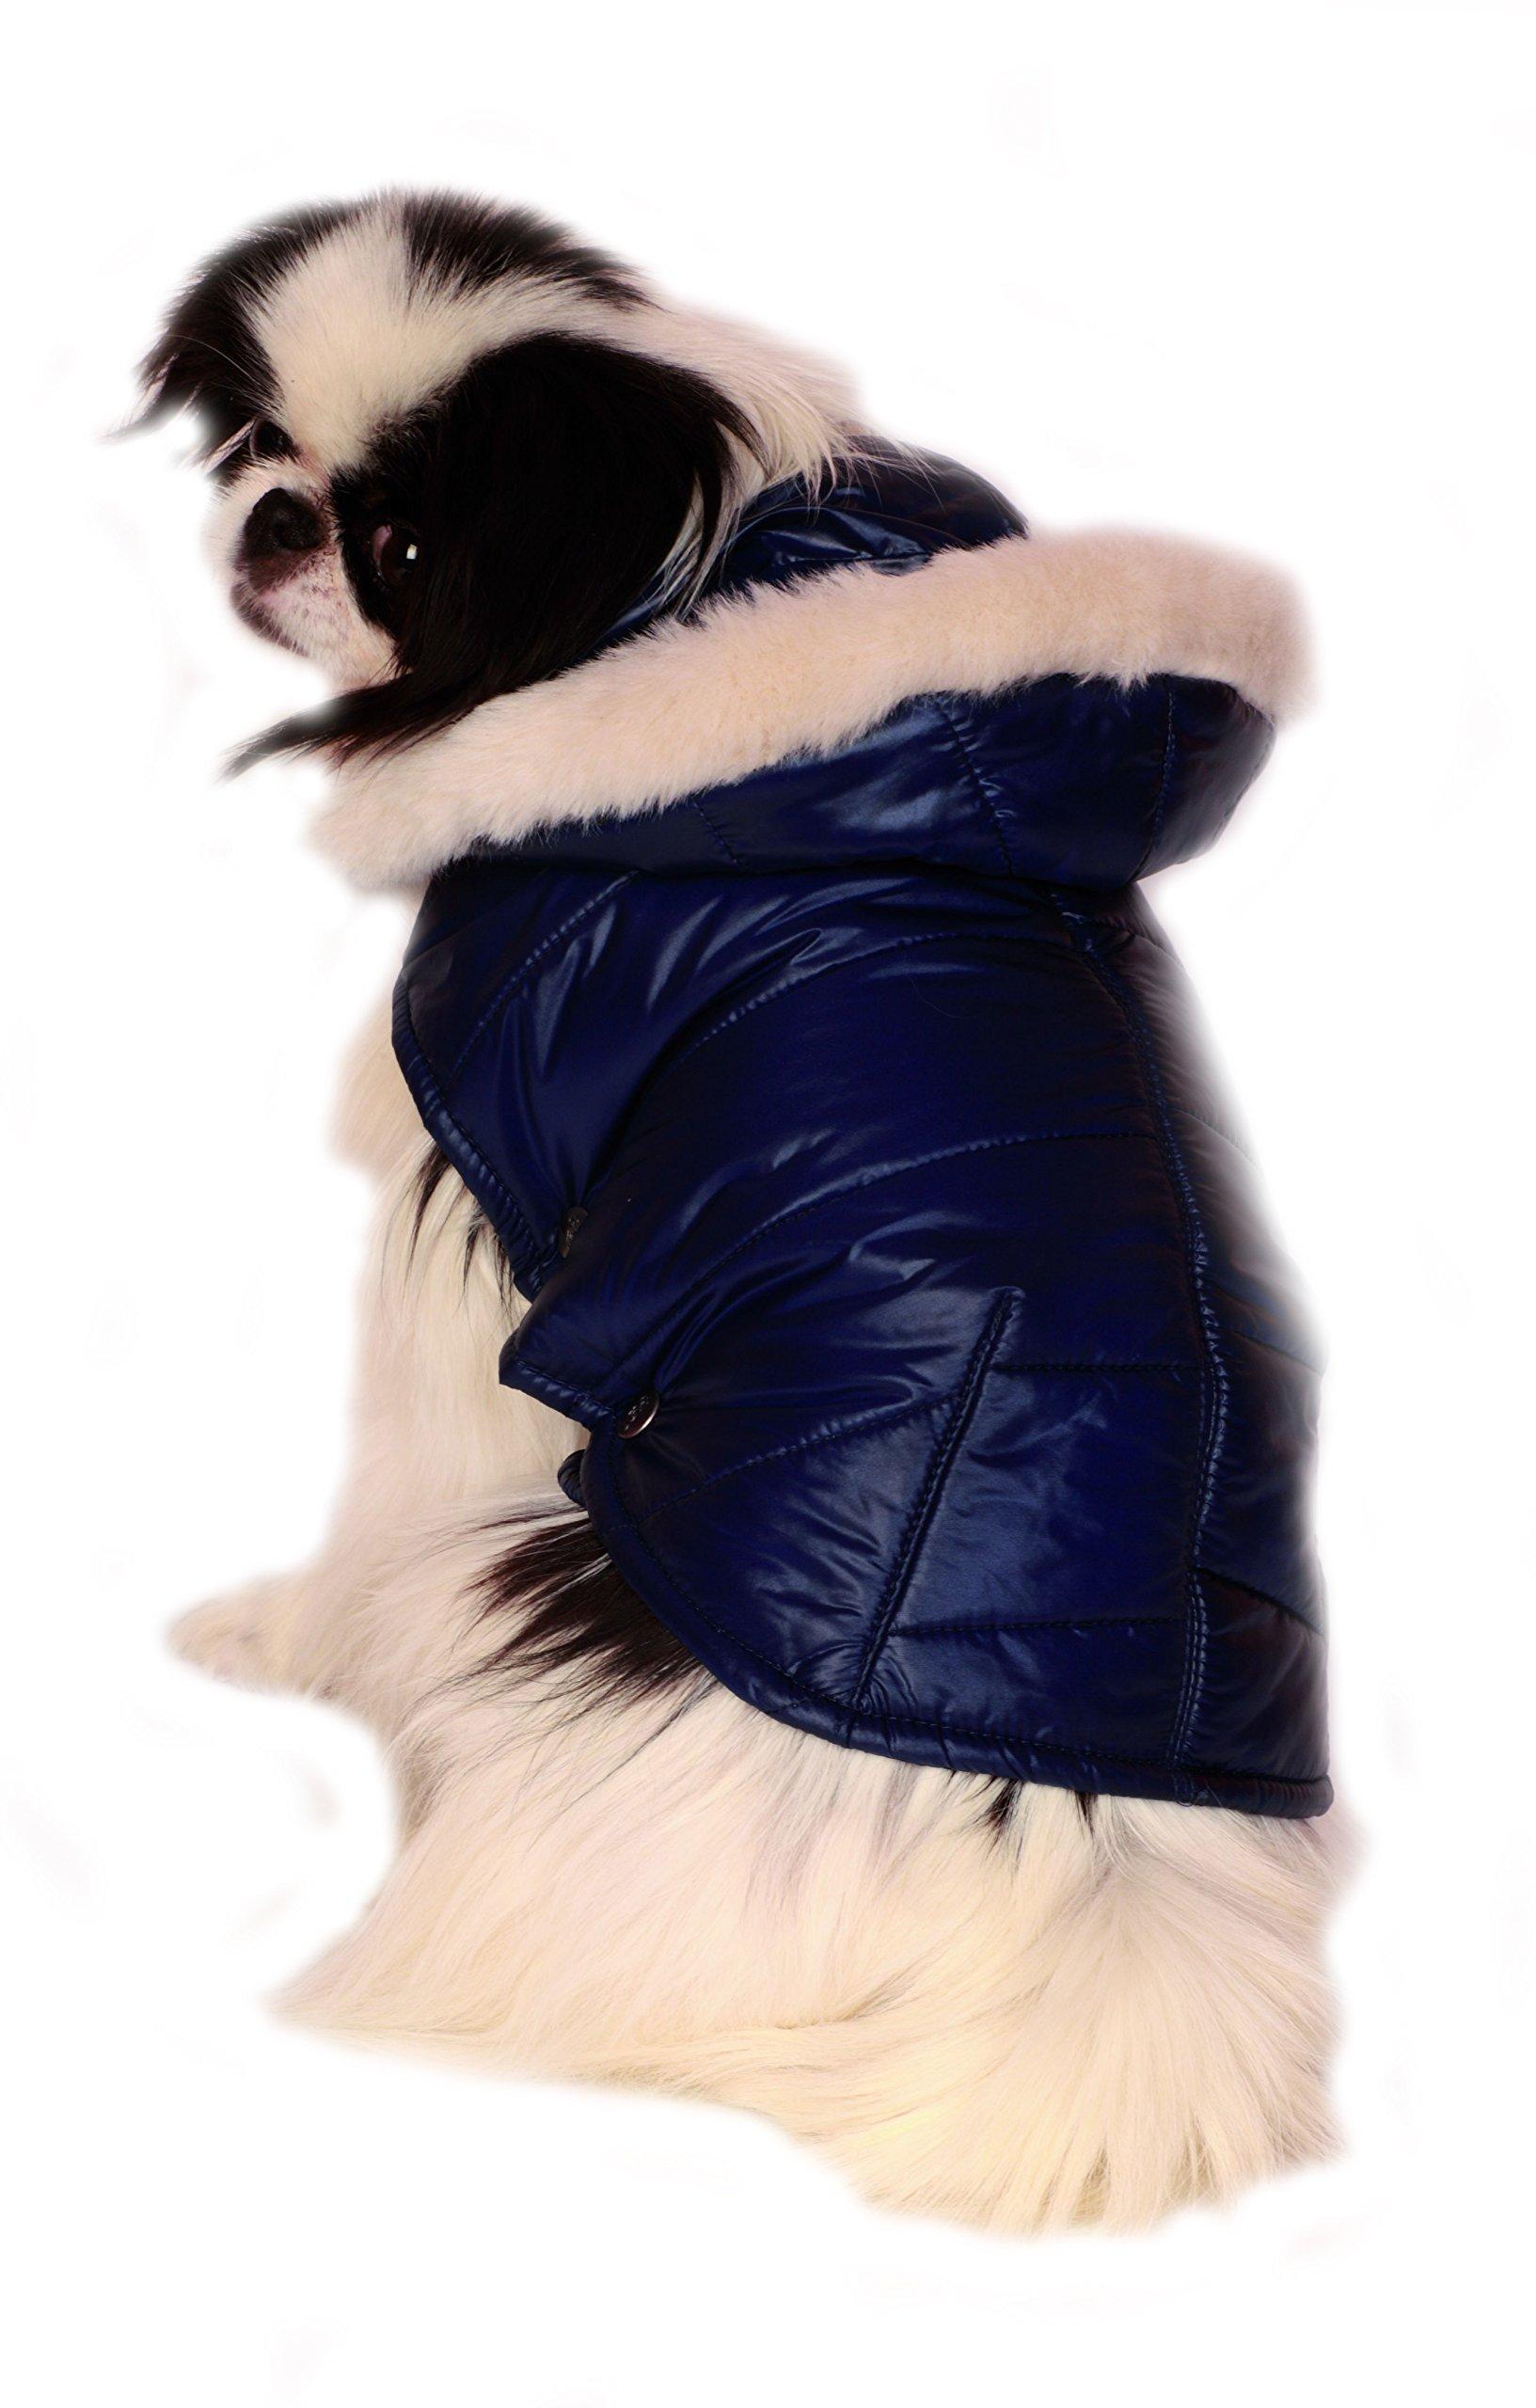 Charlotte's Dress Jacket, X-Large, Beige